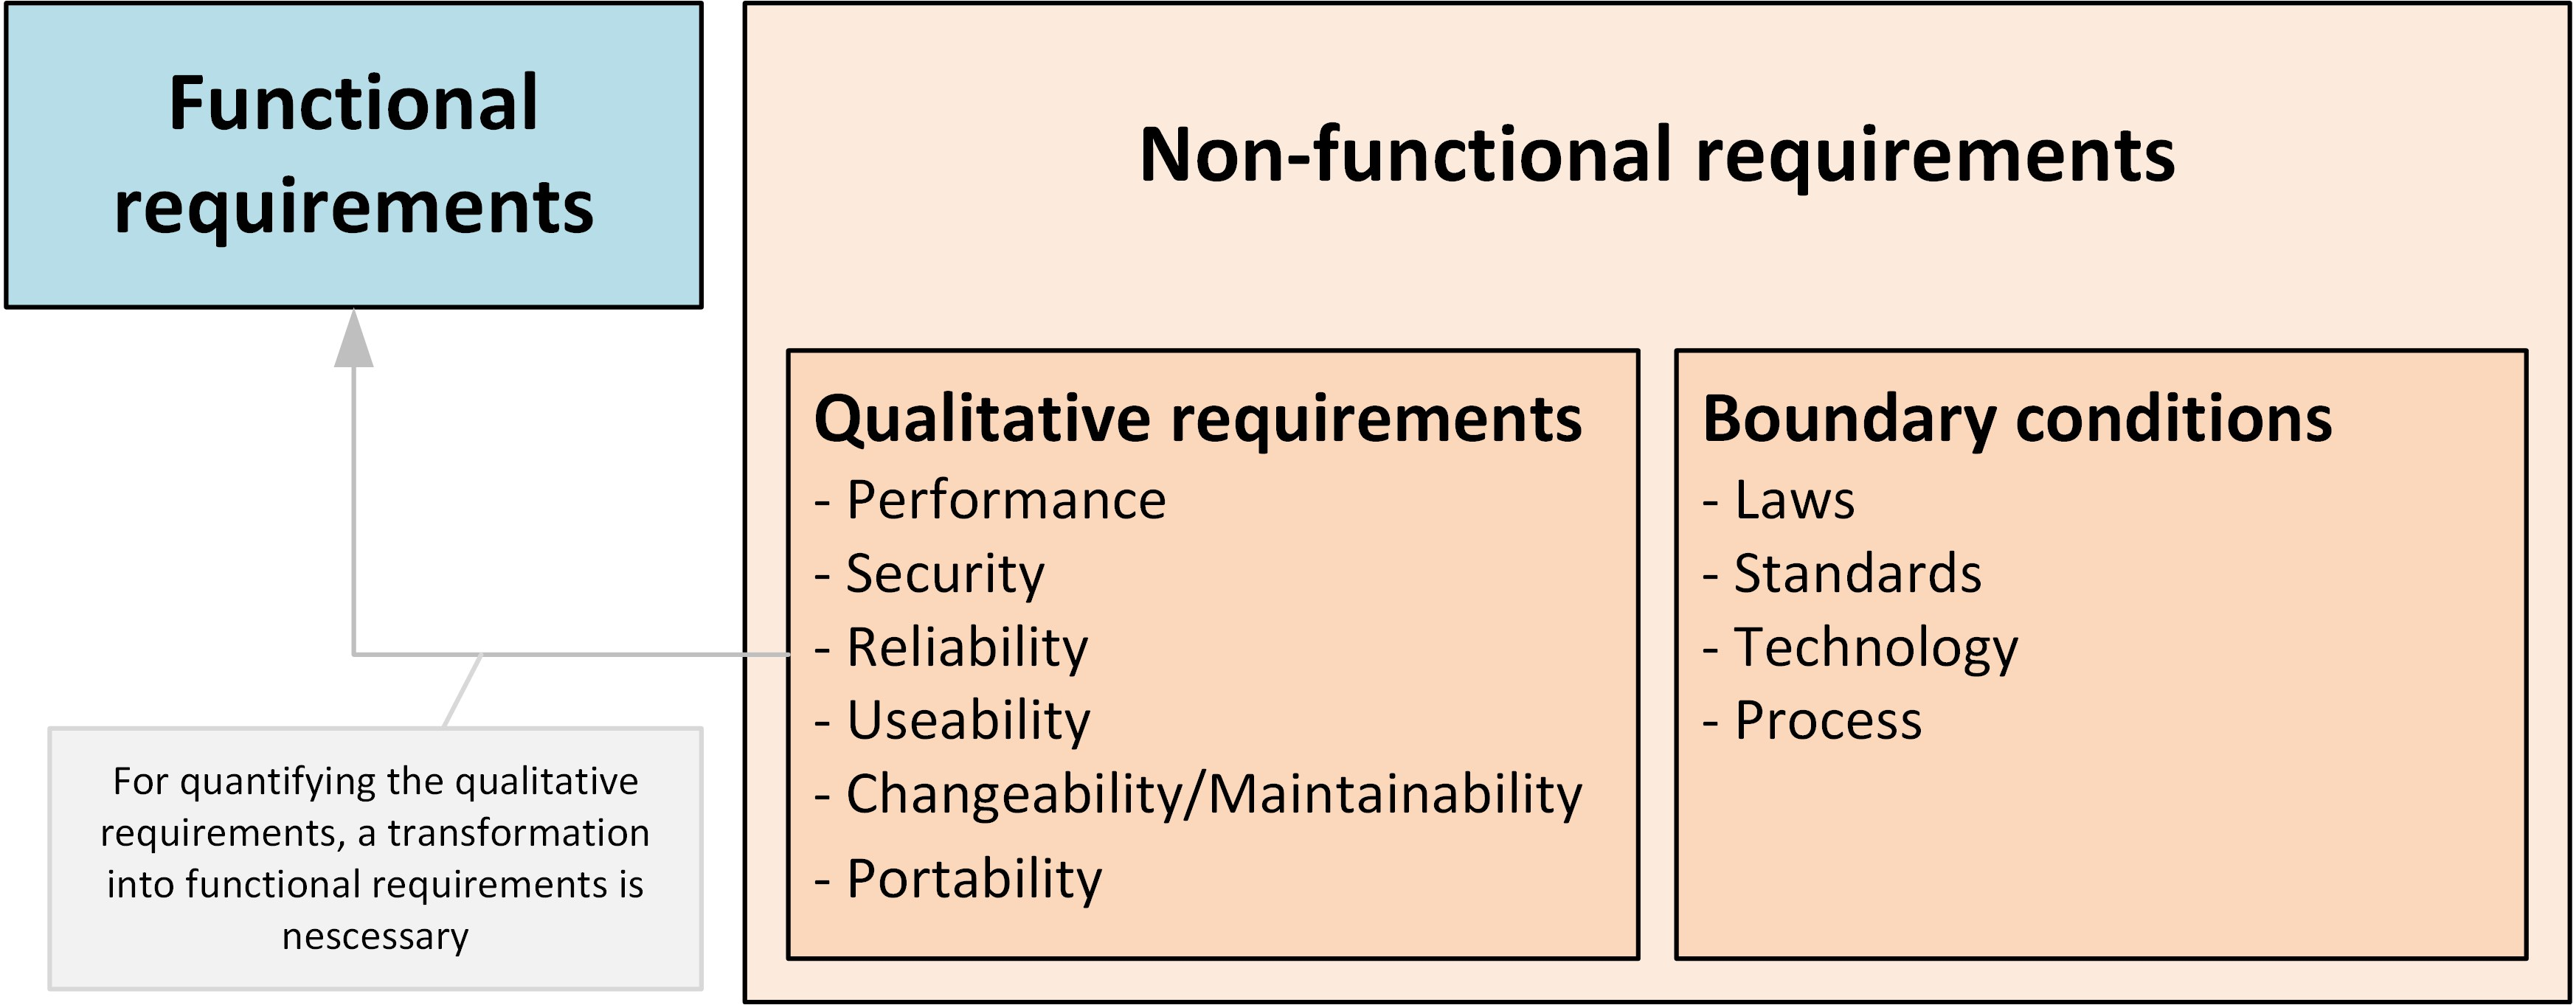 1_functional_nonfunctional_requirements